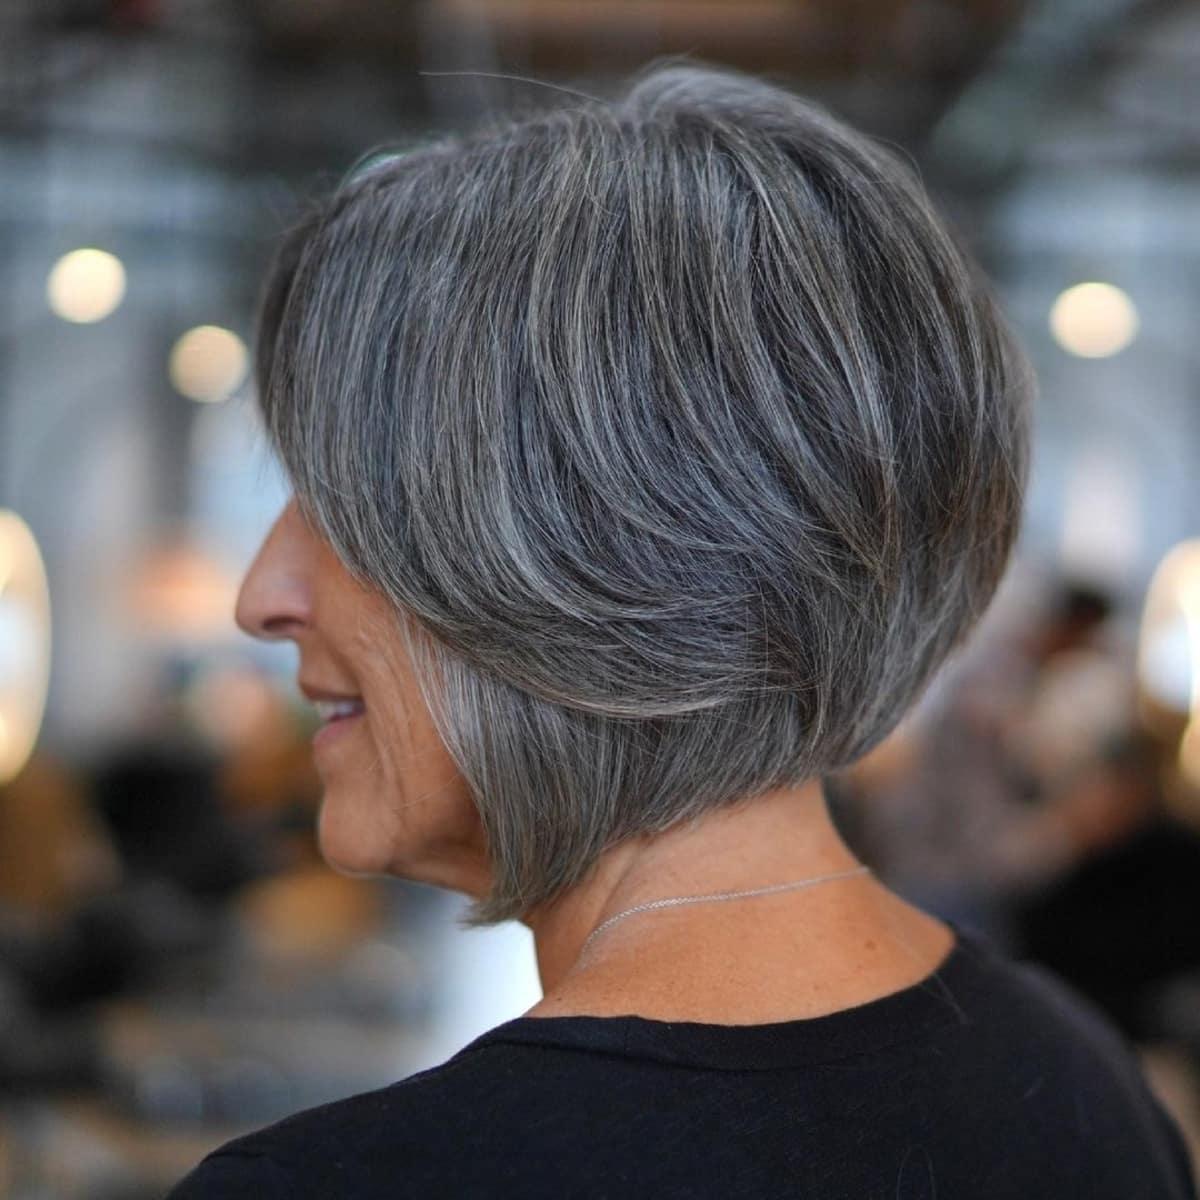 Natural salt and pepper hair